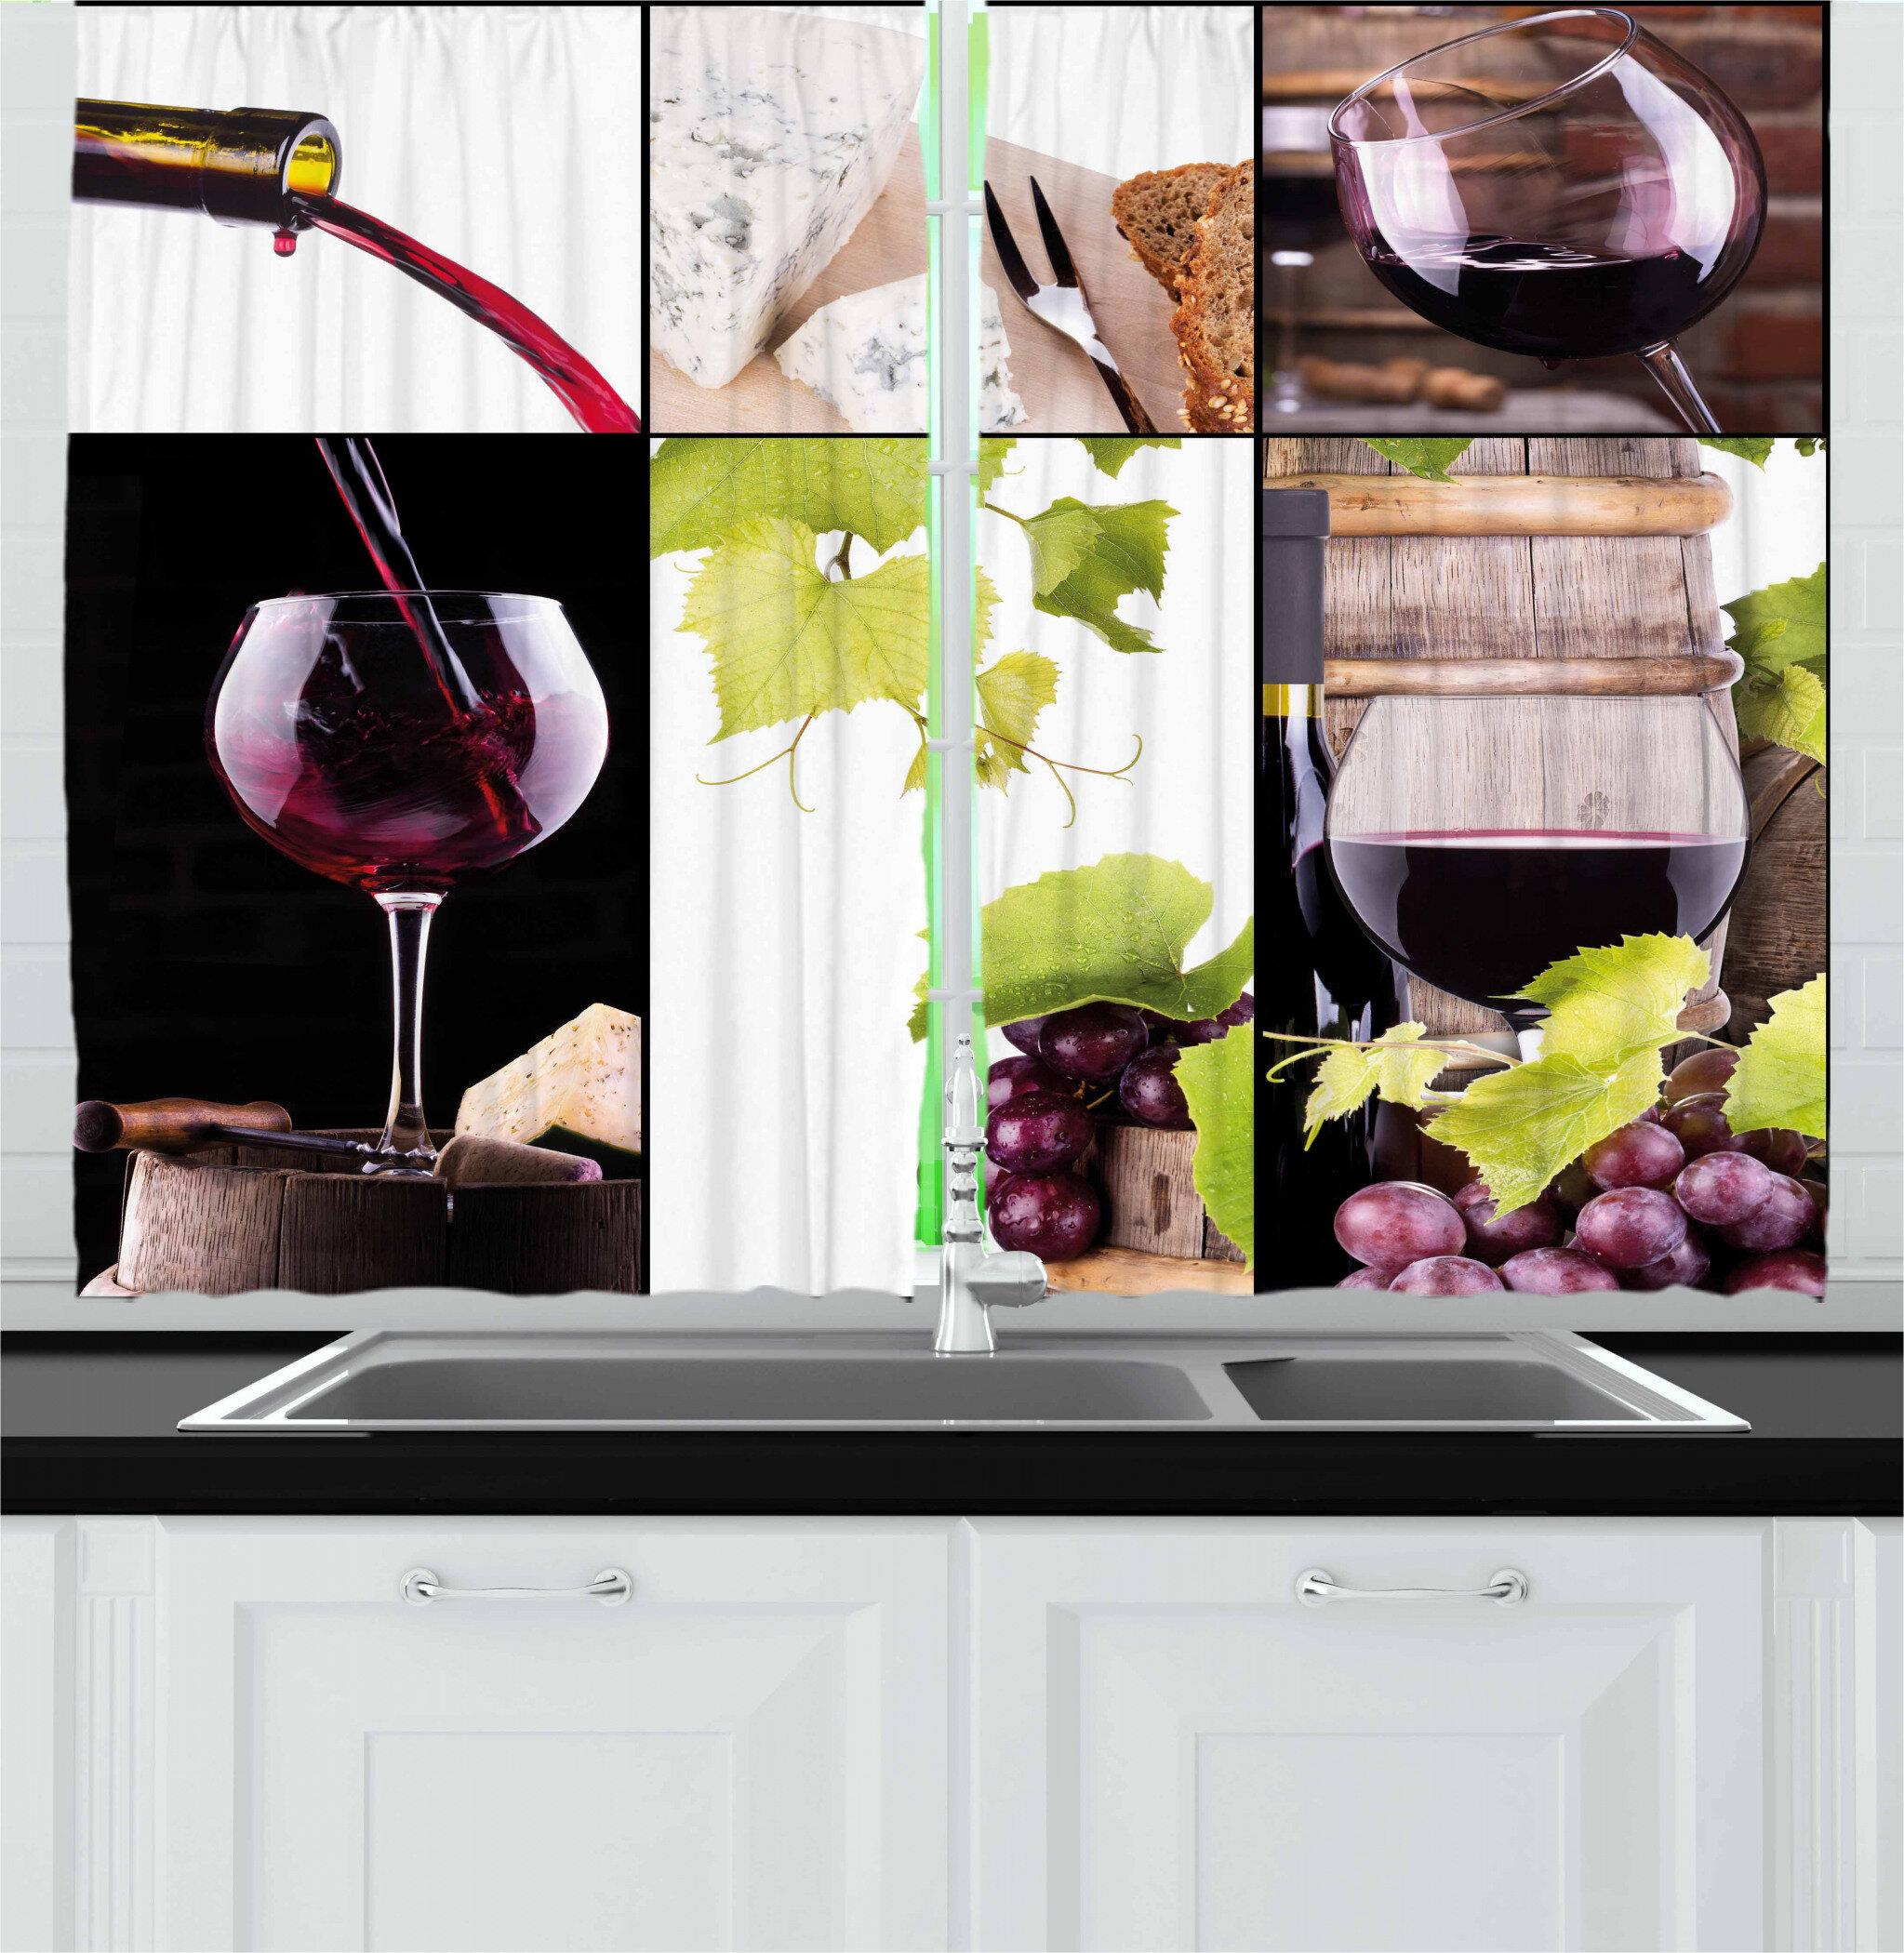 East Urban Home 2 Piece Wine Collage With Cask Bottle Wineglass Grape Gourmet Taste Beverage Kitchen Curtain Wayfair